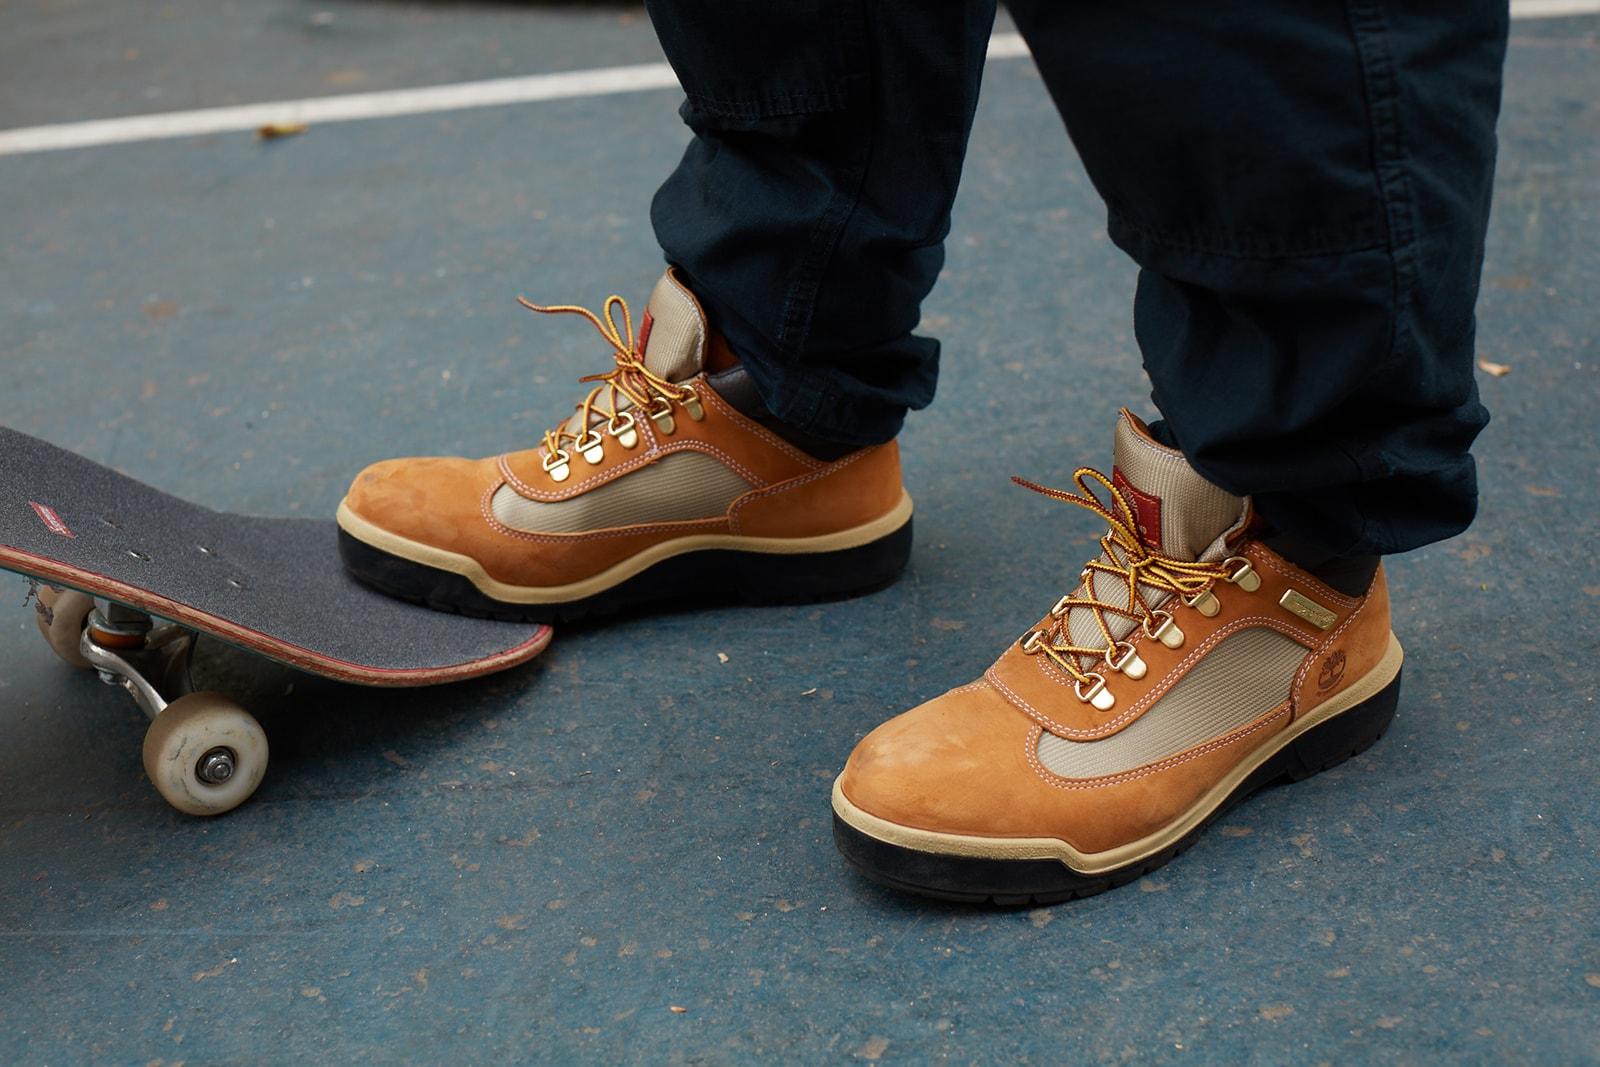 timberland field boot matt mooney skateboarding video nyc new york city